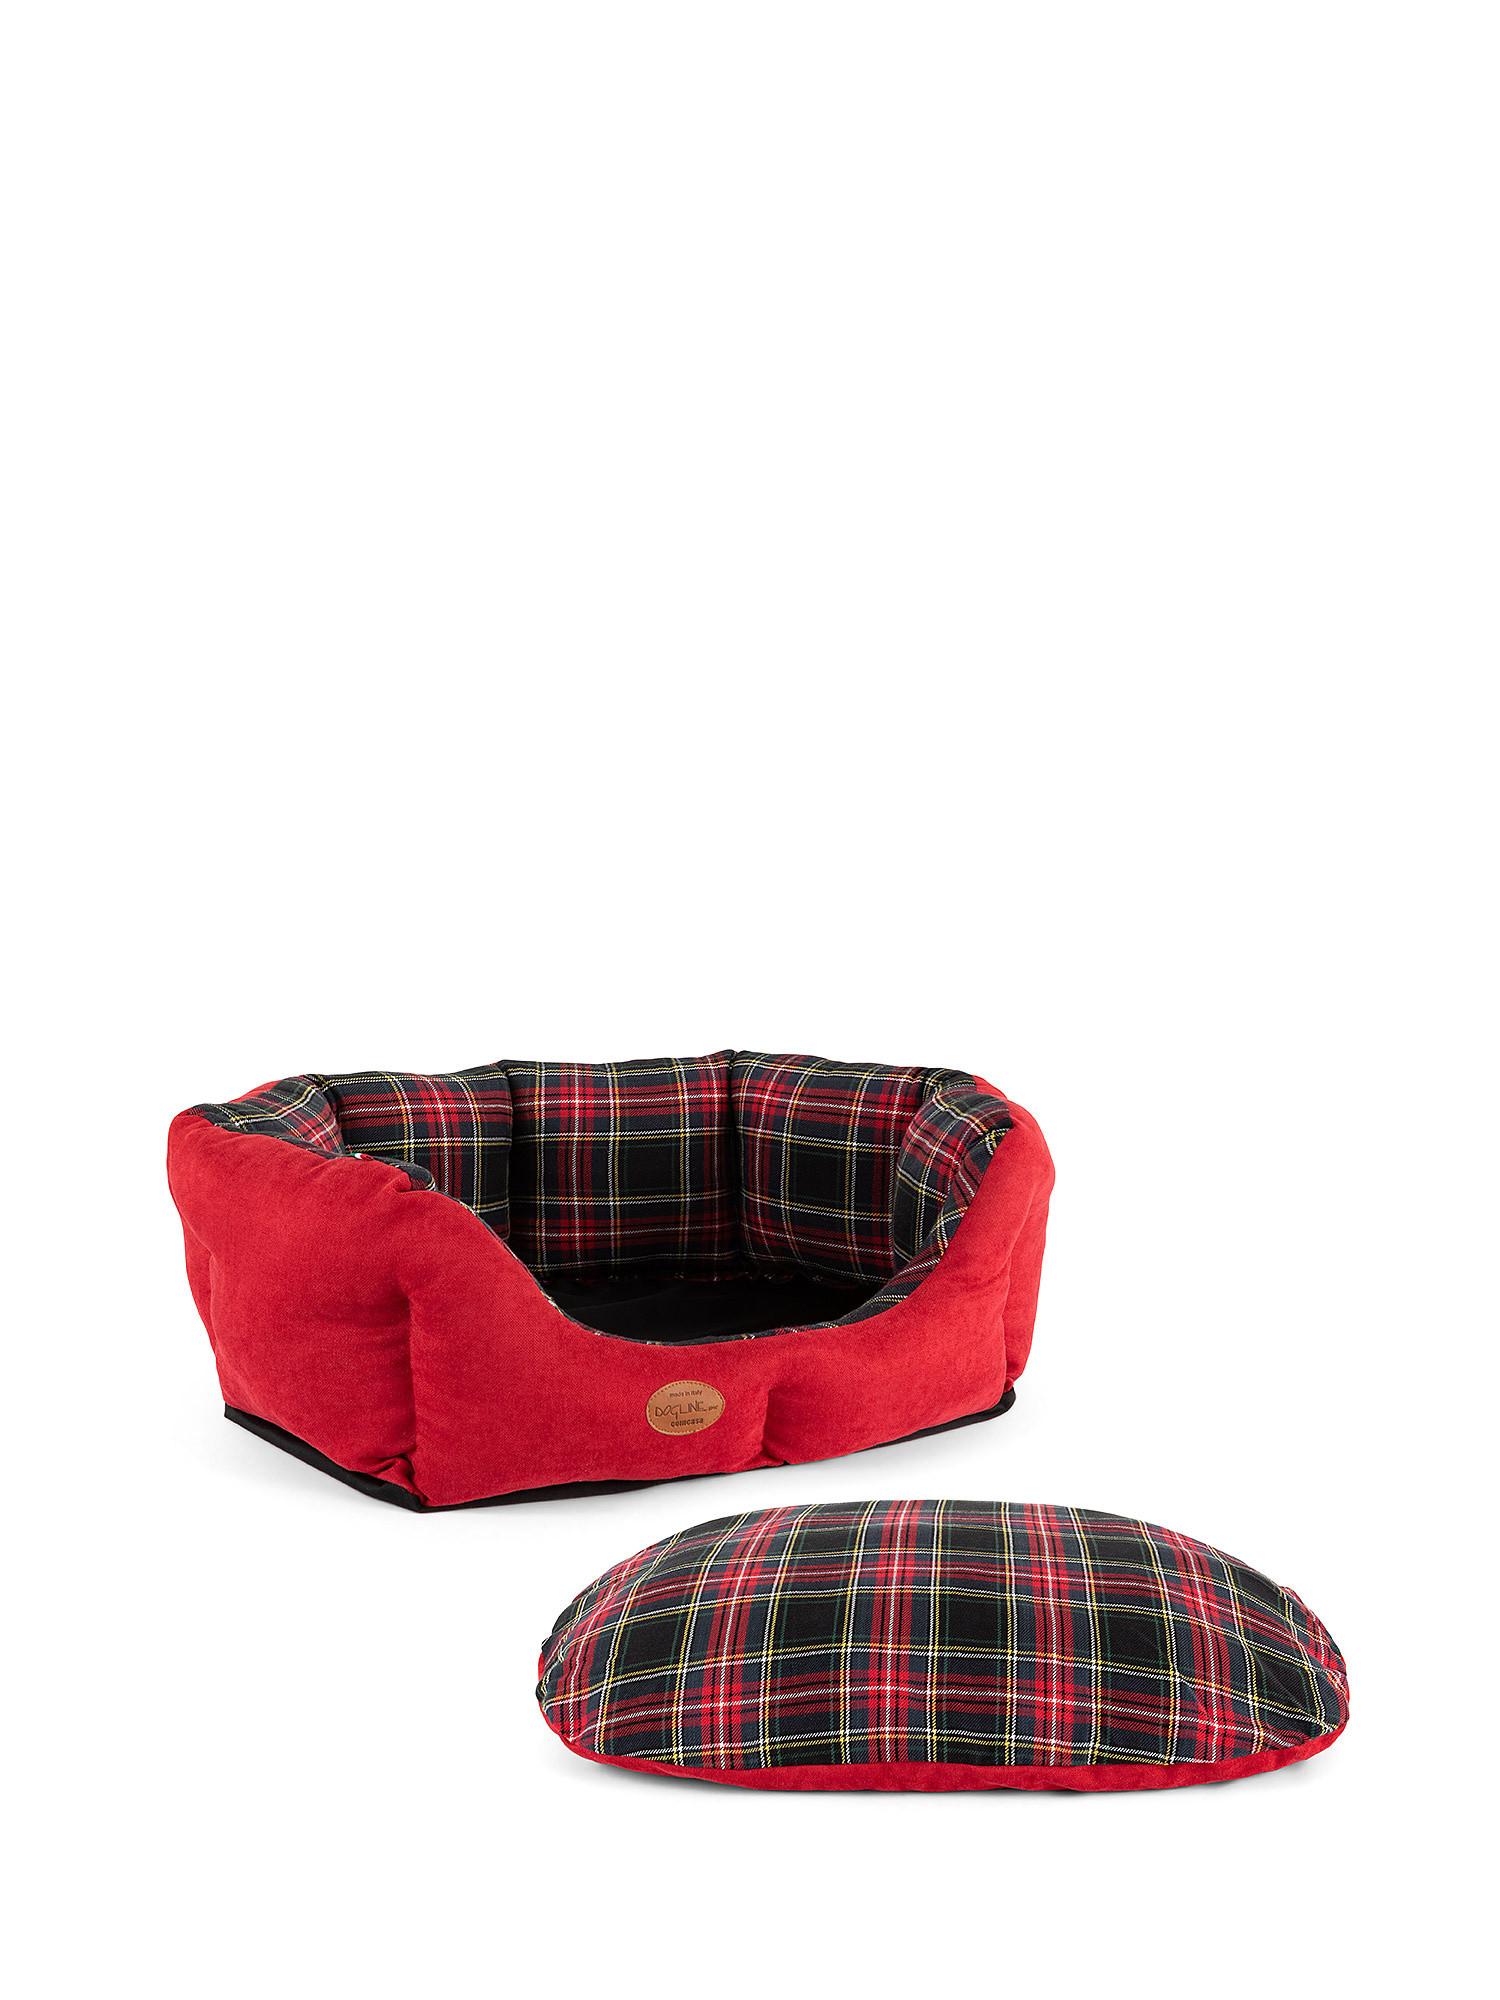 Cuccia trapuntata motivo tartan, Rosso, large image number 5